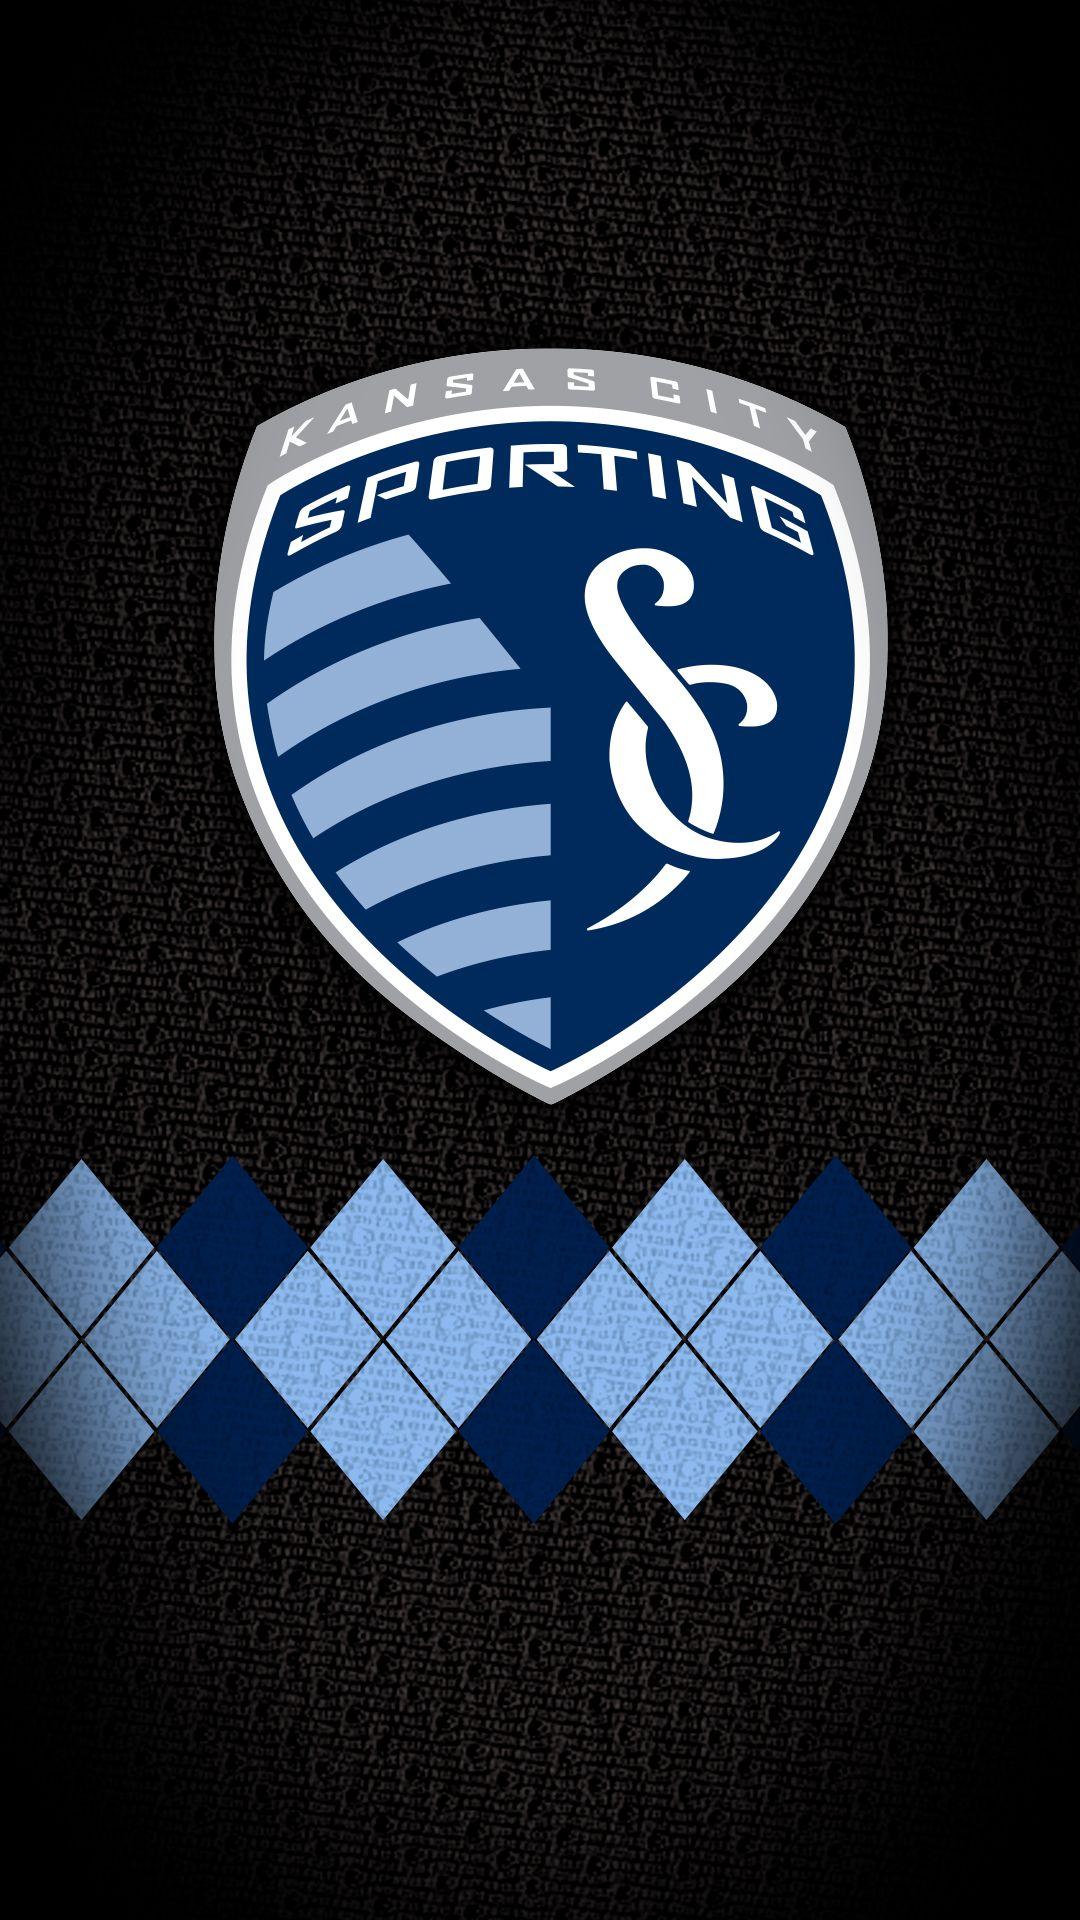 Wallpapers Sporting Kansas City Futbol Pinterest Sporting - Sporting kc wall decals